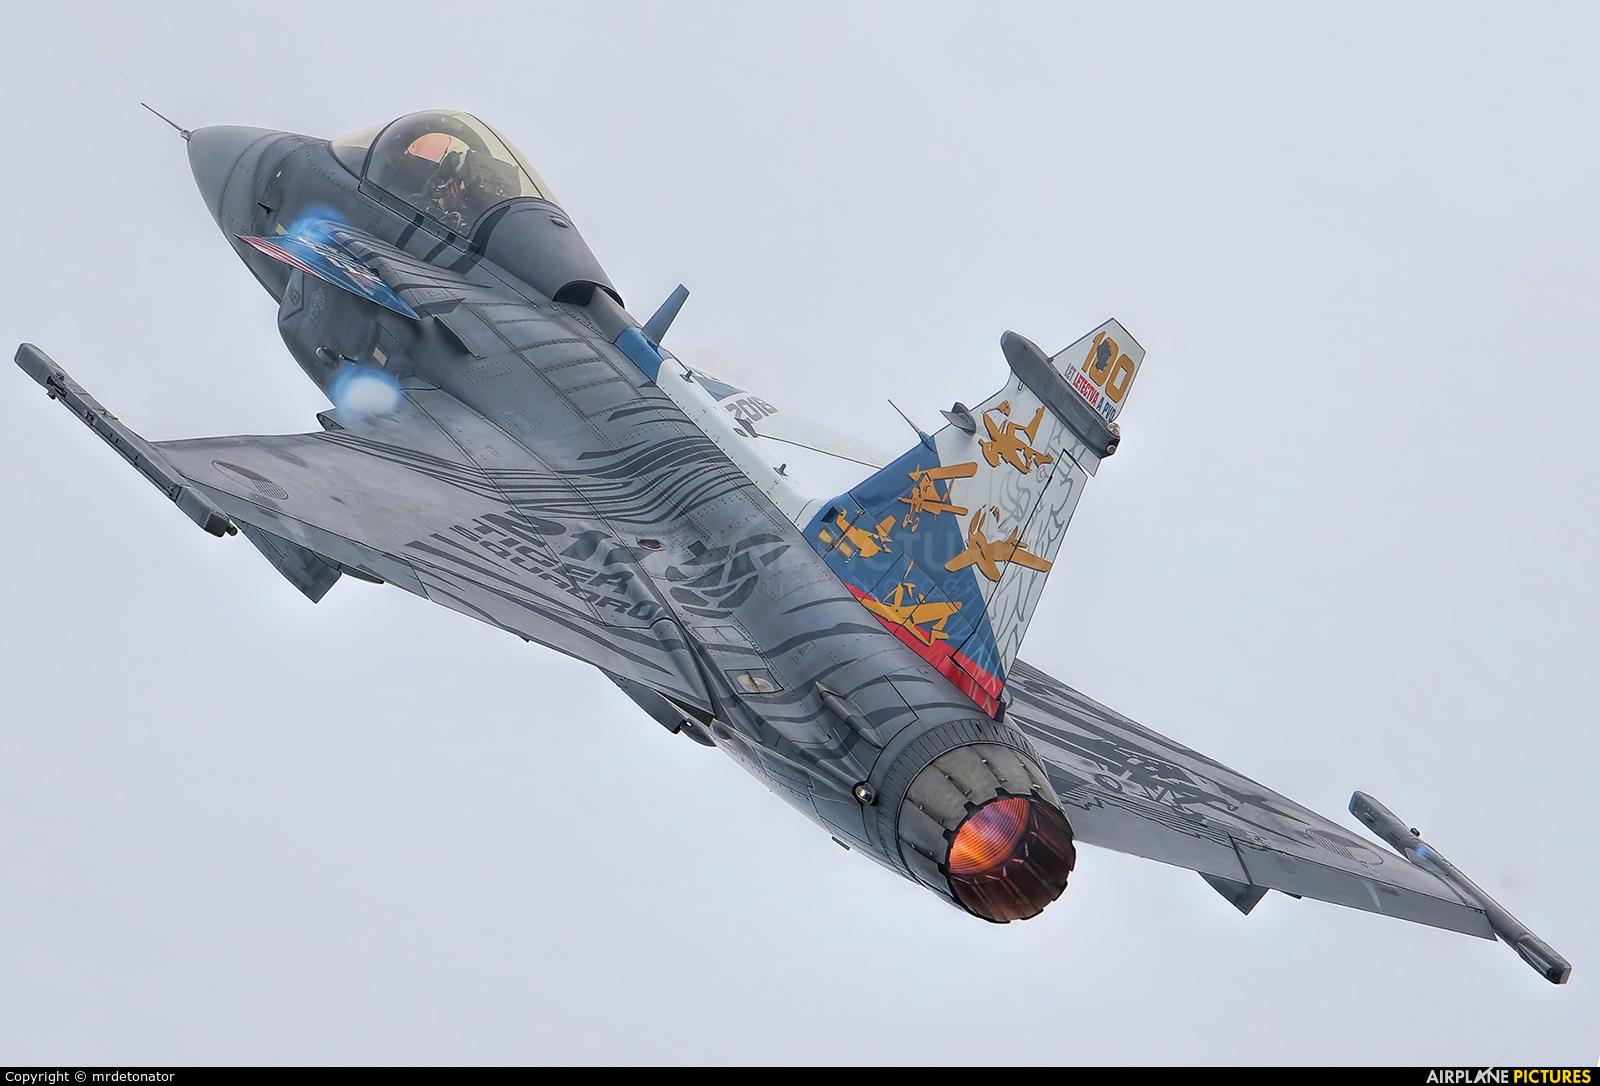 Czech - Air Force 9234 aircraft at Radom - Sadków